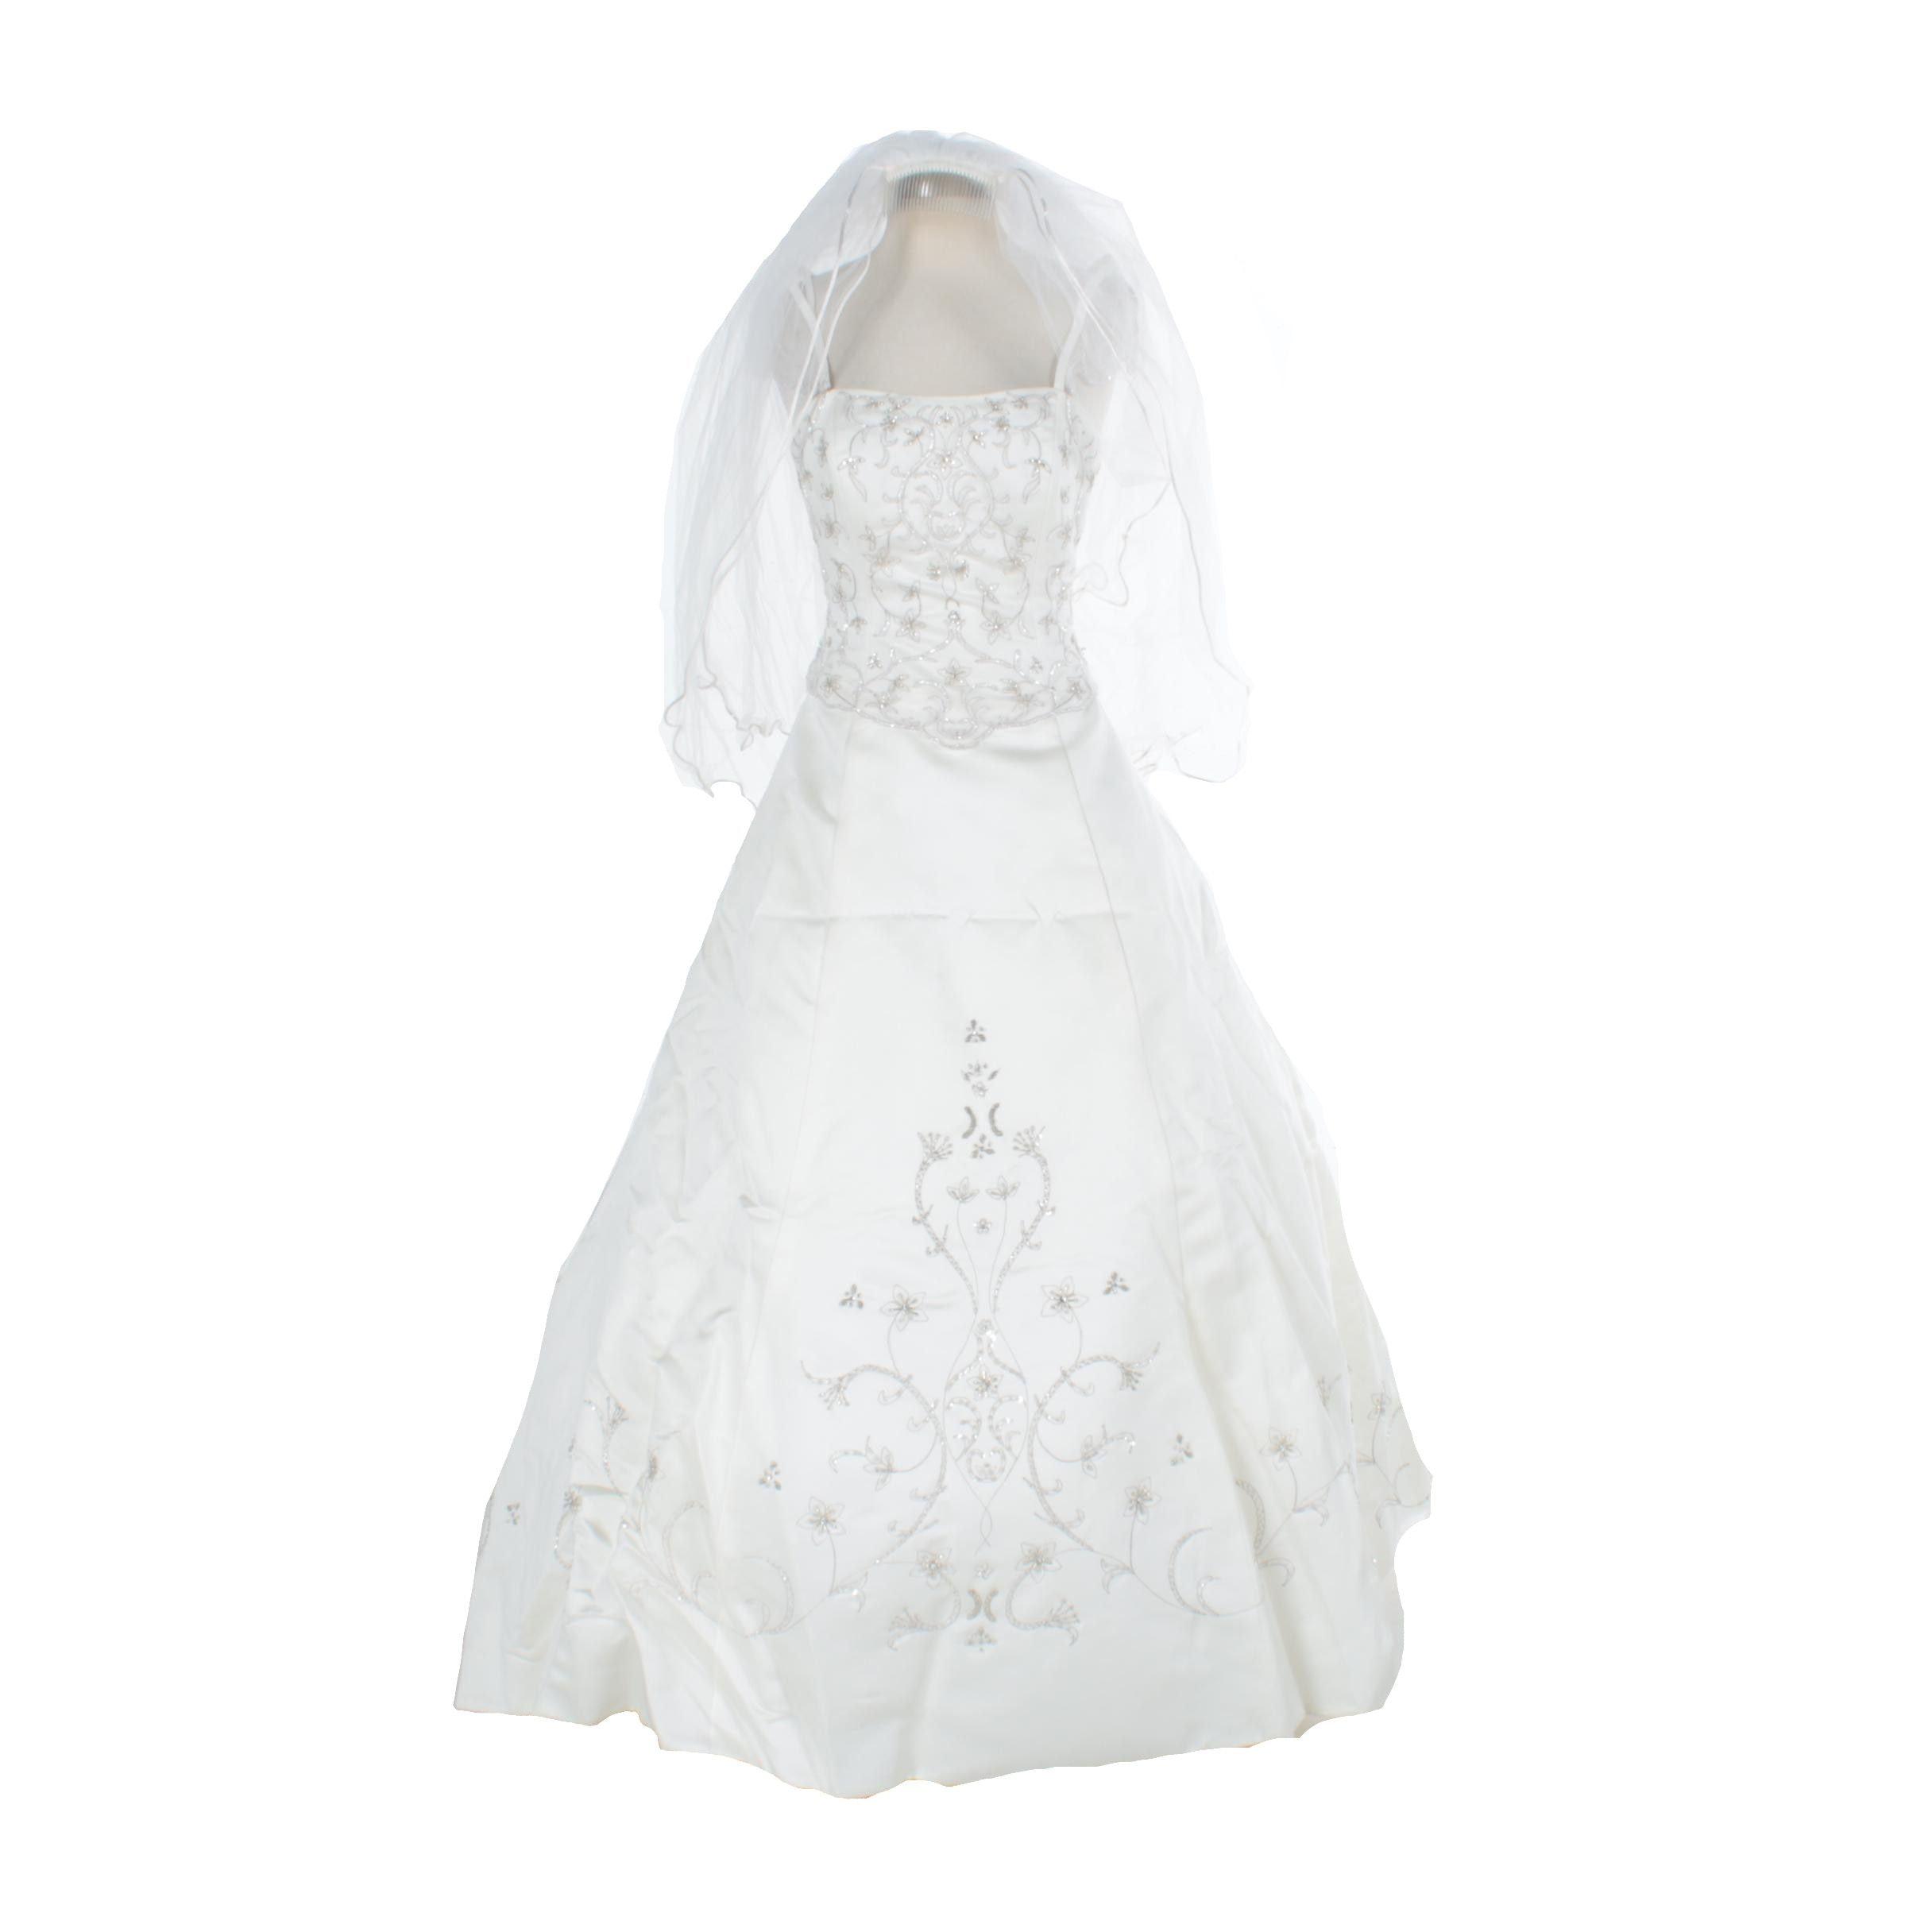 Sleeveless Beaded Wedding Gown with Veil